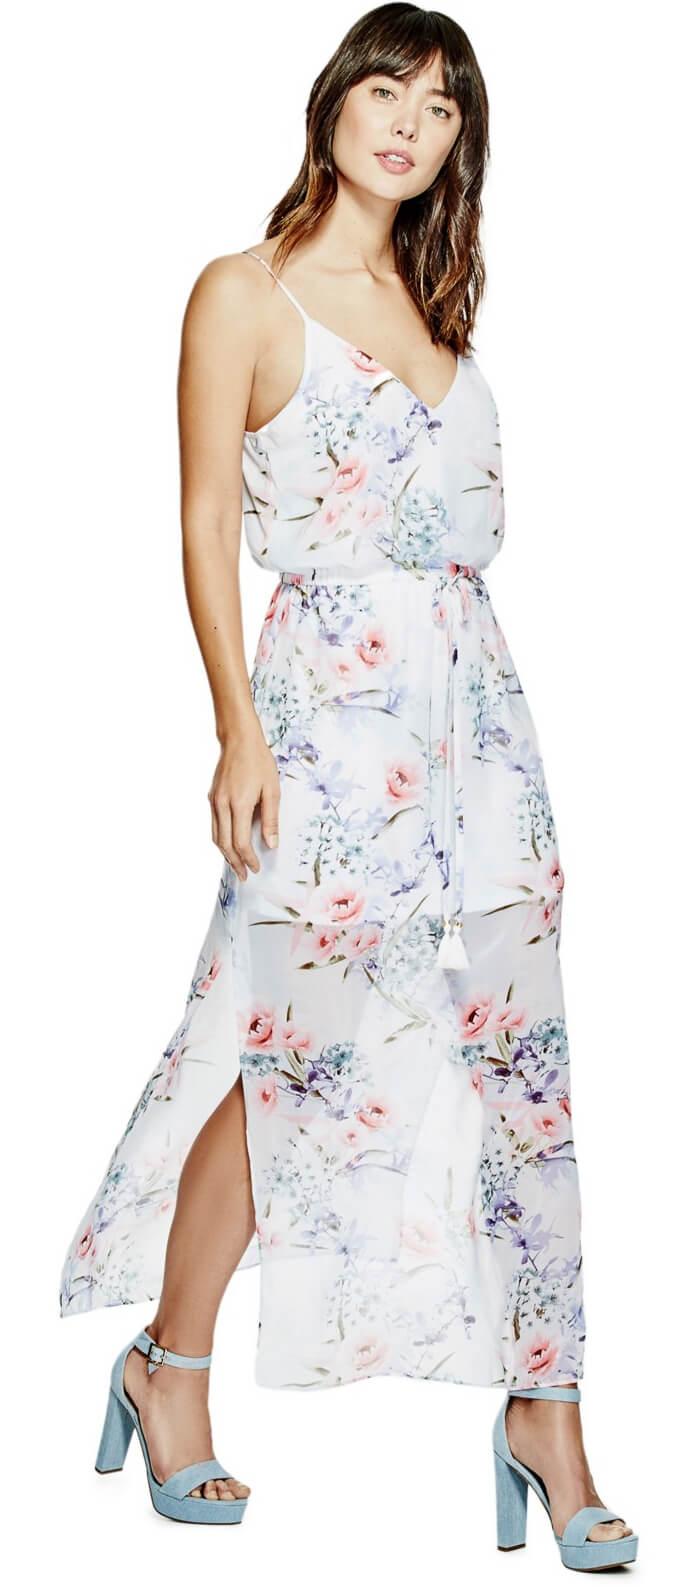 Guess Dámské šaty Laurel Maxi Dress Doprava ZDARMA  11ed7c959b